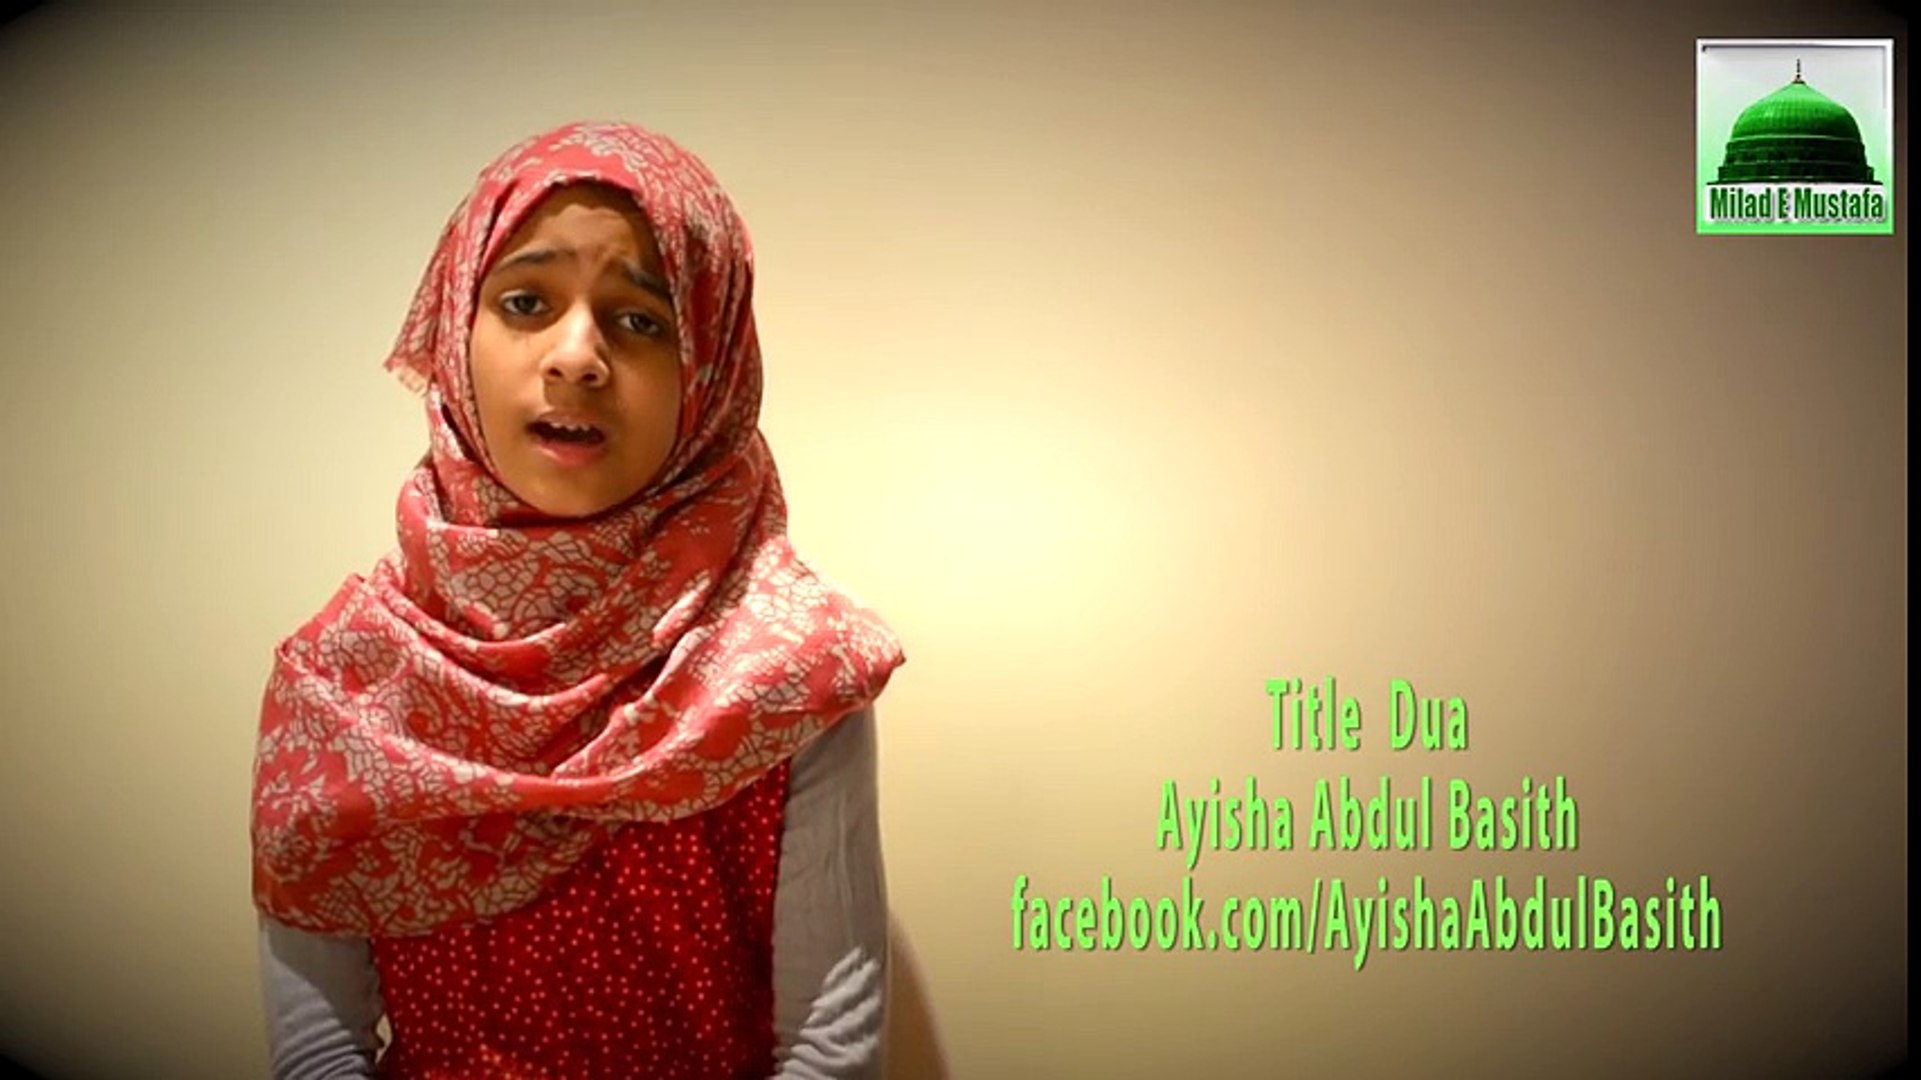 Beautiful Dua Karam Mangti Hoon Dua By Beautiful Little Ayisha Abdul Basith _ Naat Available on Ch